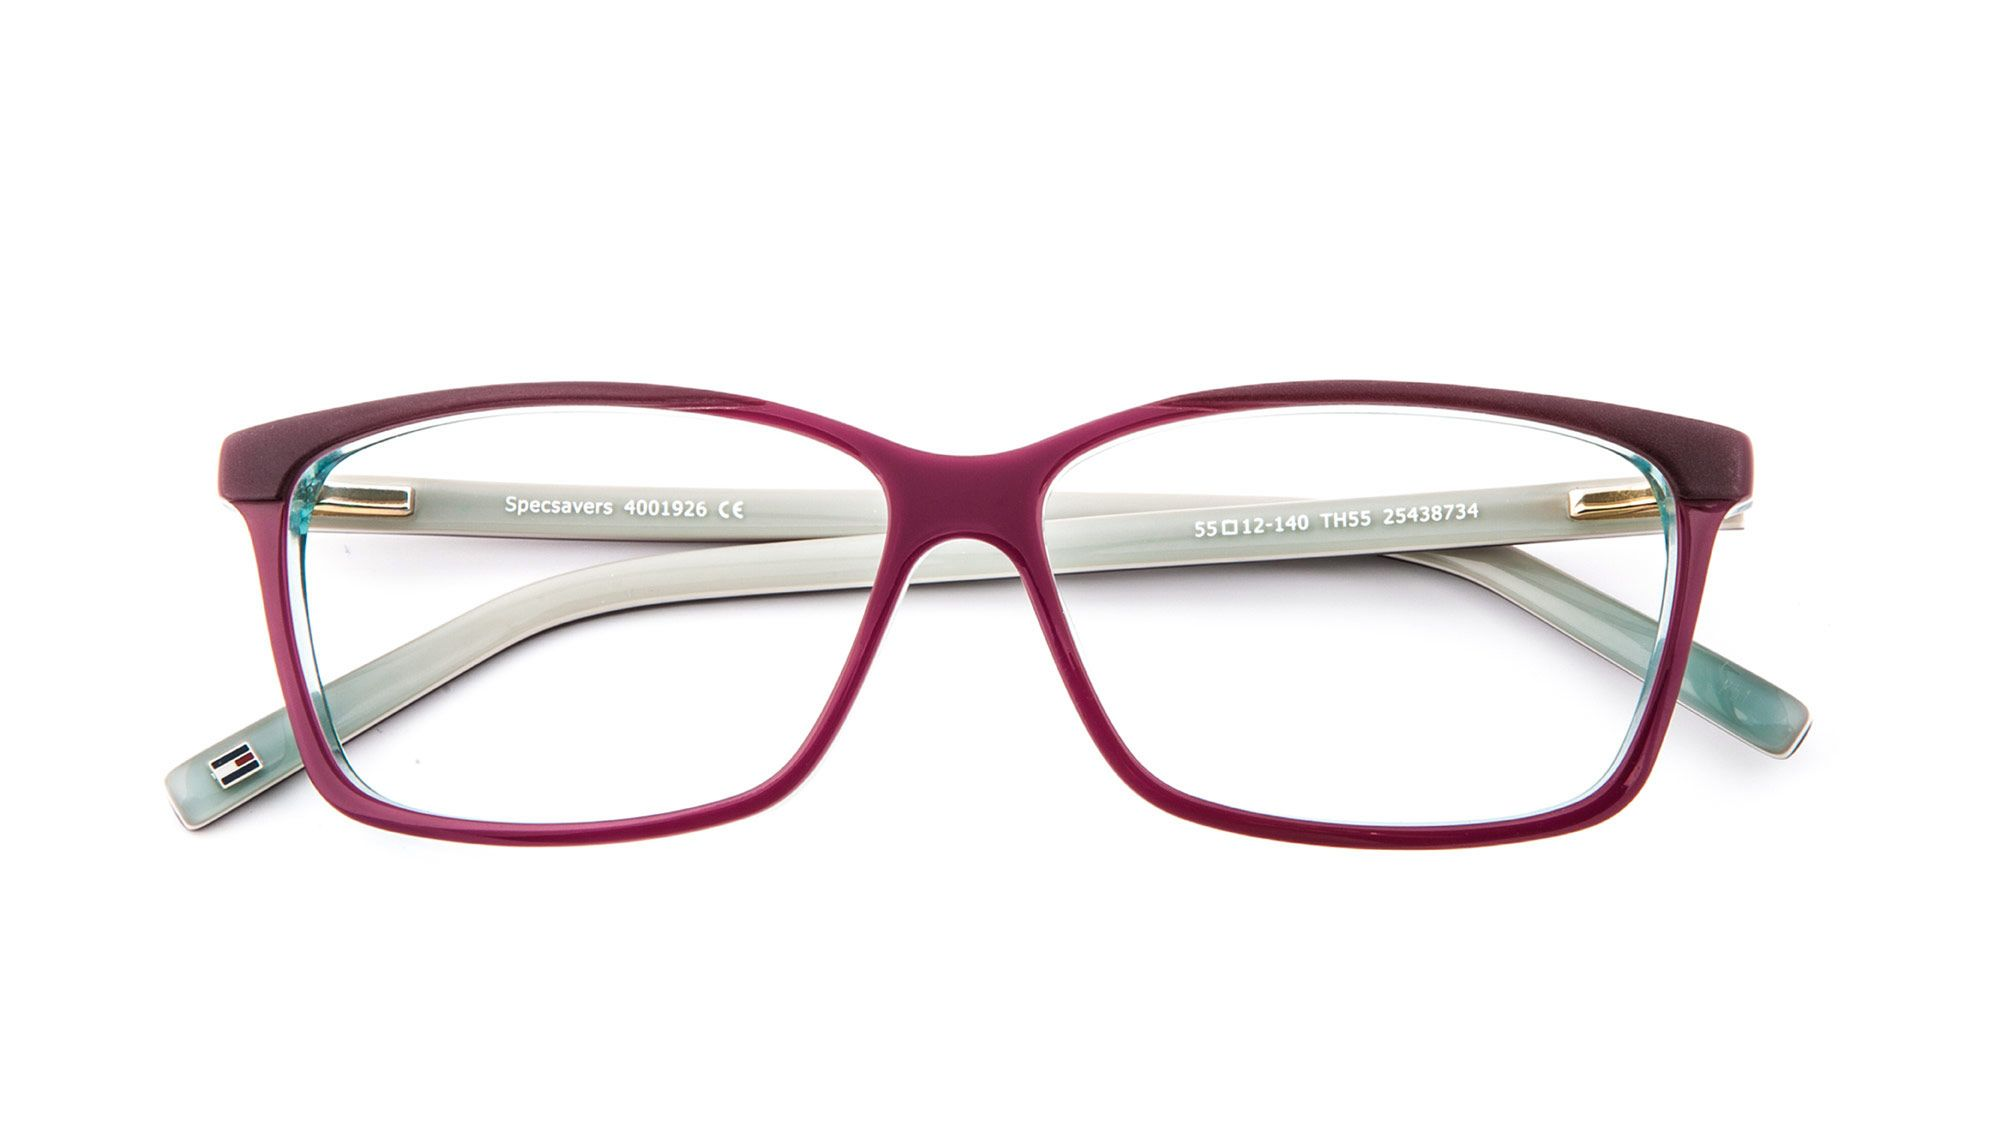 57cfe0bba6f2 Tommy Hilfiger glasses - TH 55 £125